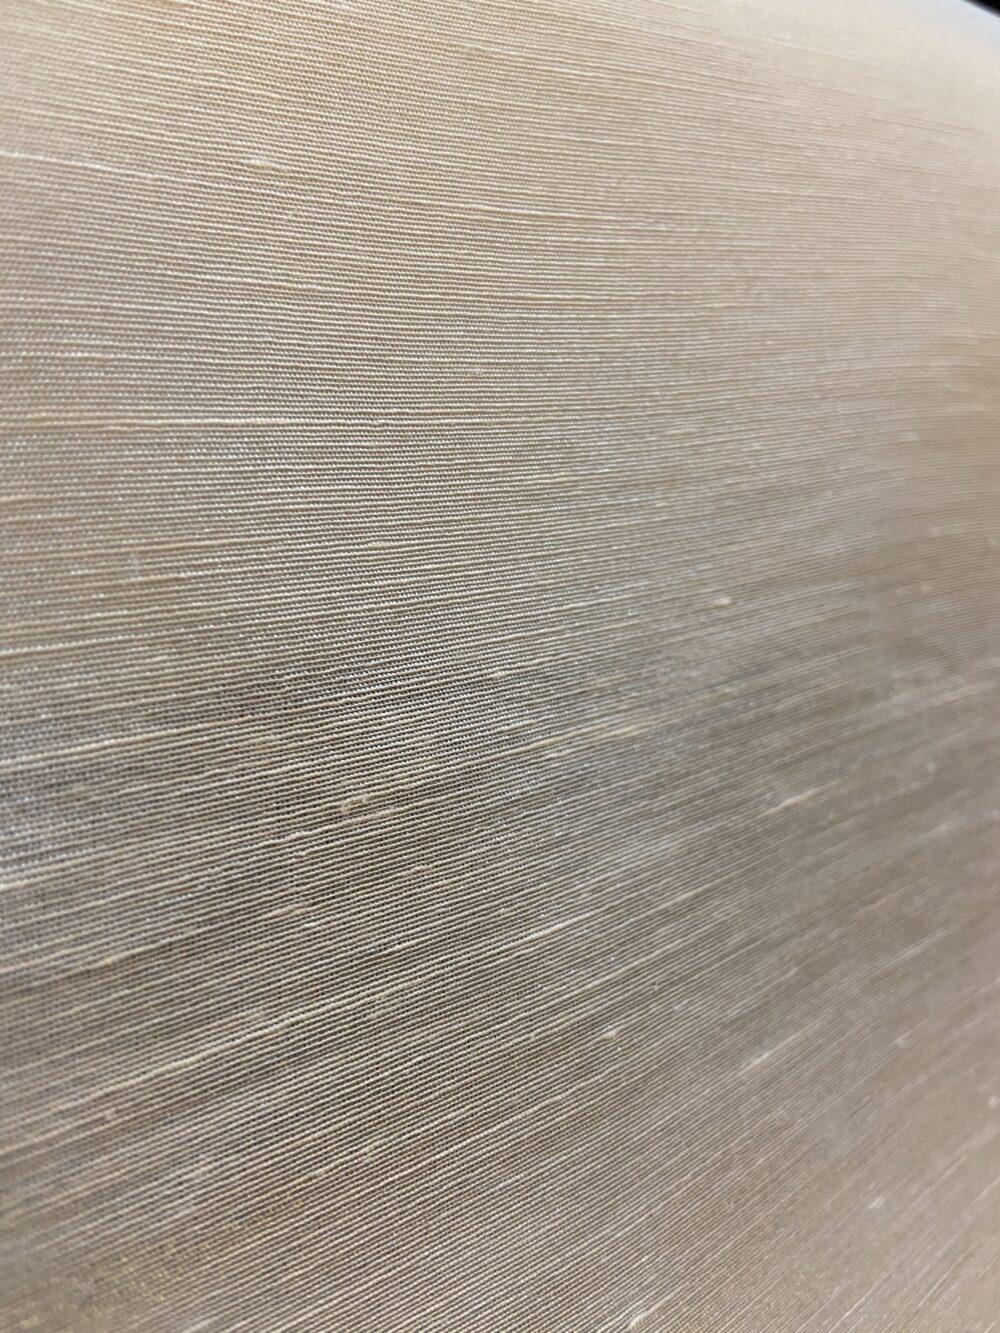 Raw Hemp and Silk Blend Fabric